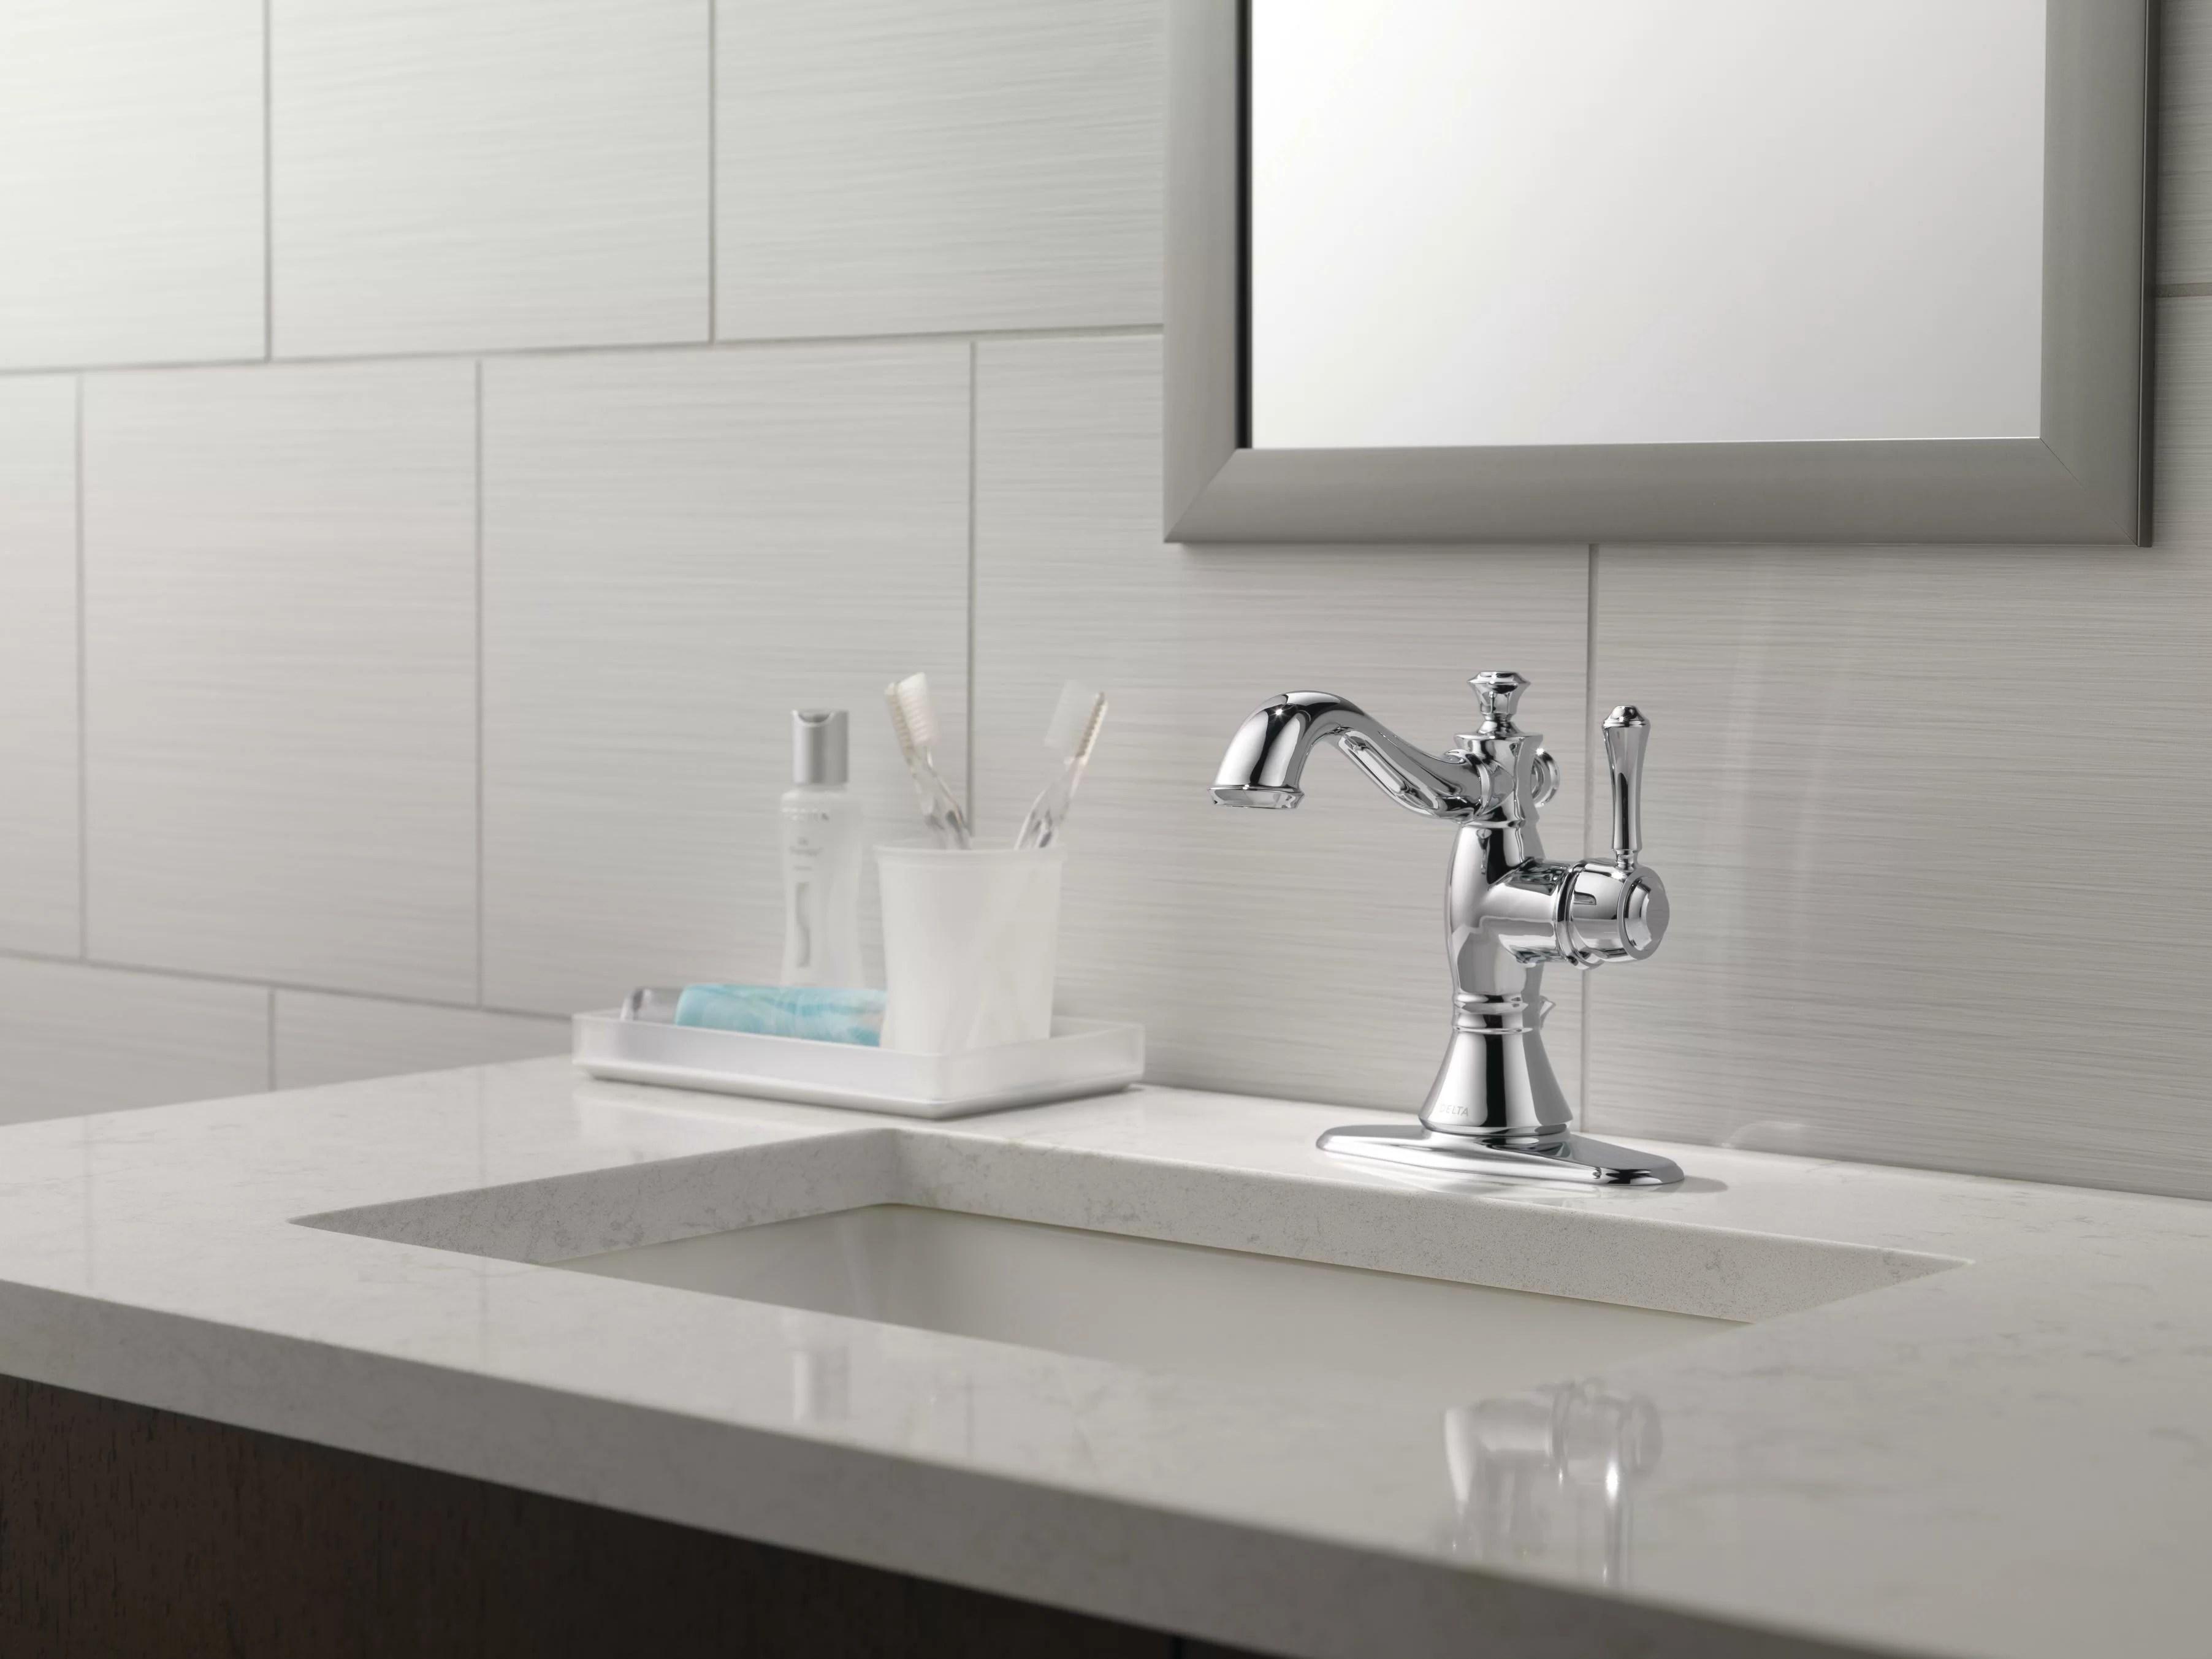 597lf pnmpu mpu czmpu delta cassidy single hole bathroom faucet with drain assembly reviews wayfair